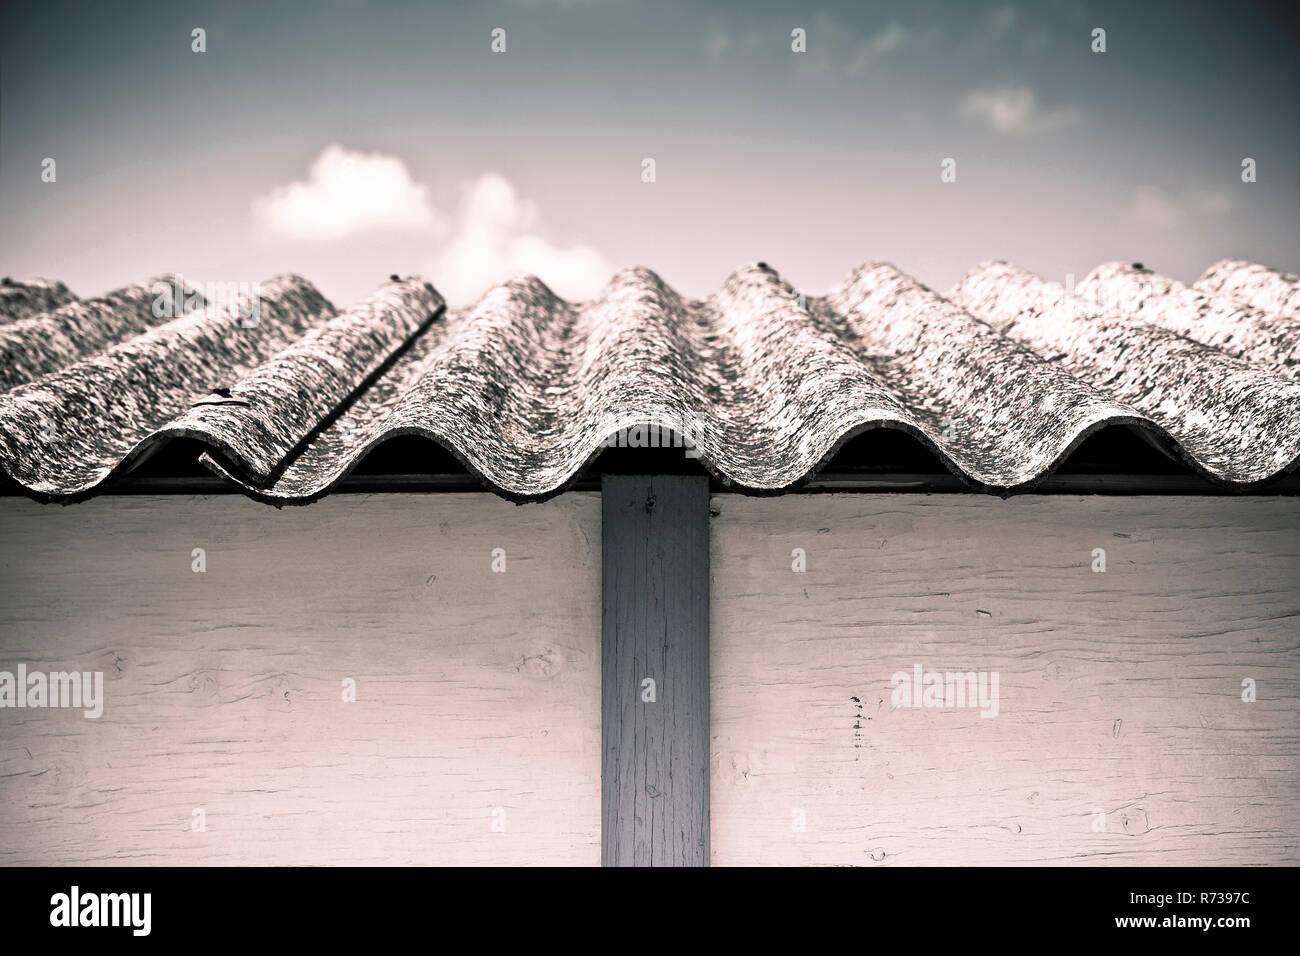 Dangerous asbestos roof - Medical studies have shown that